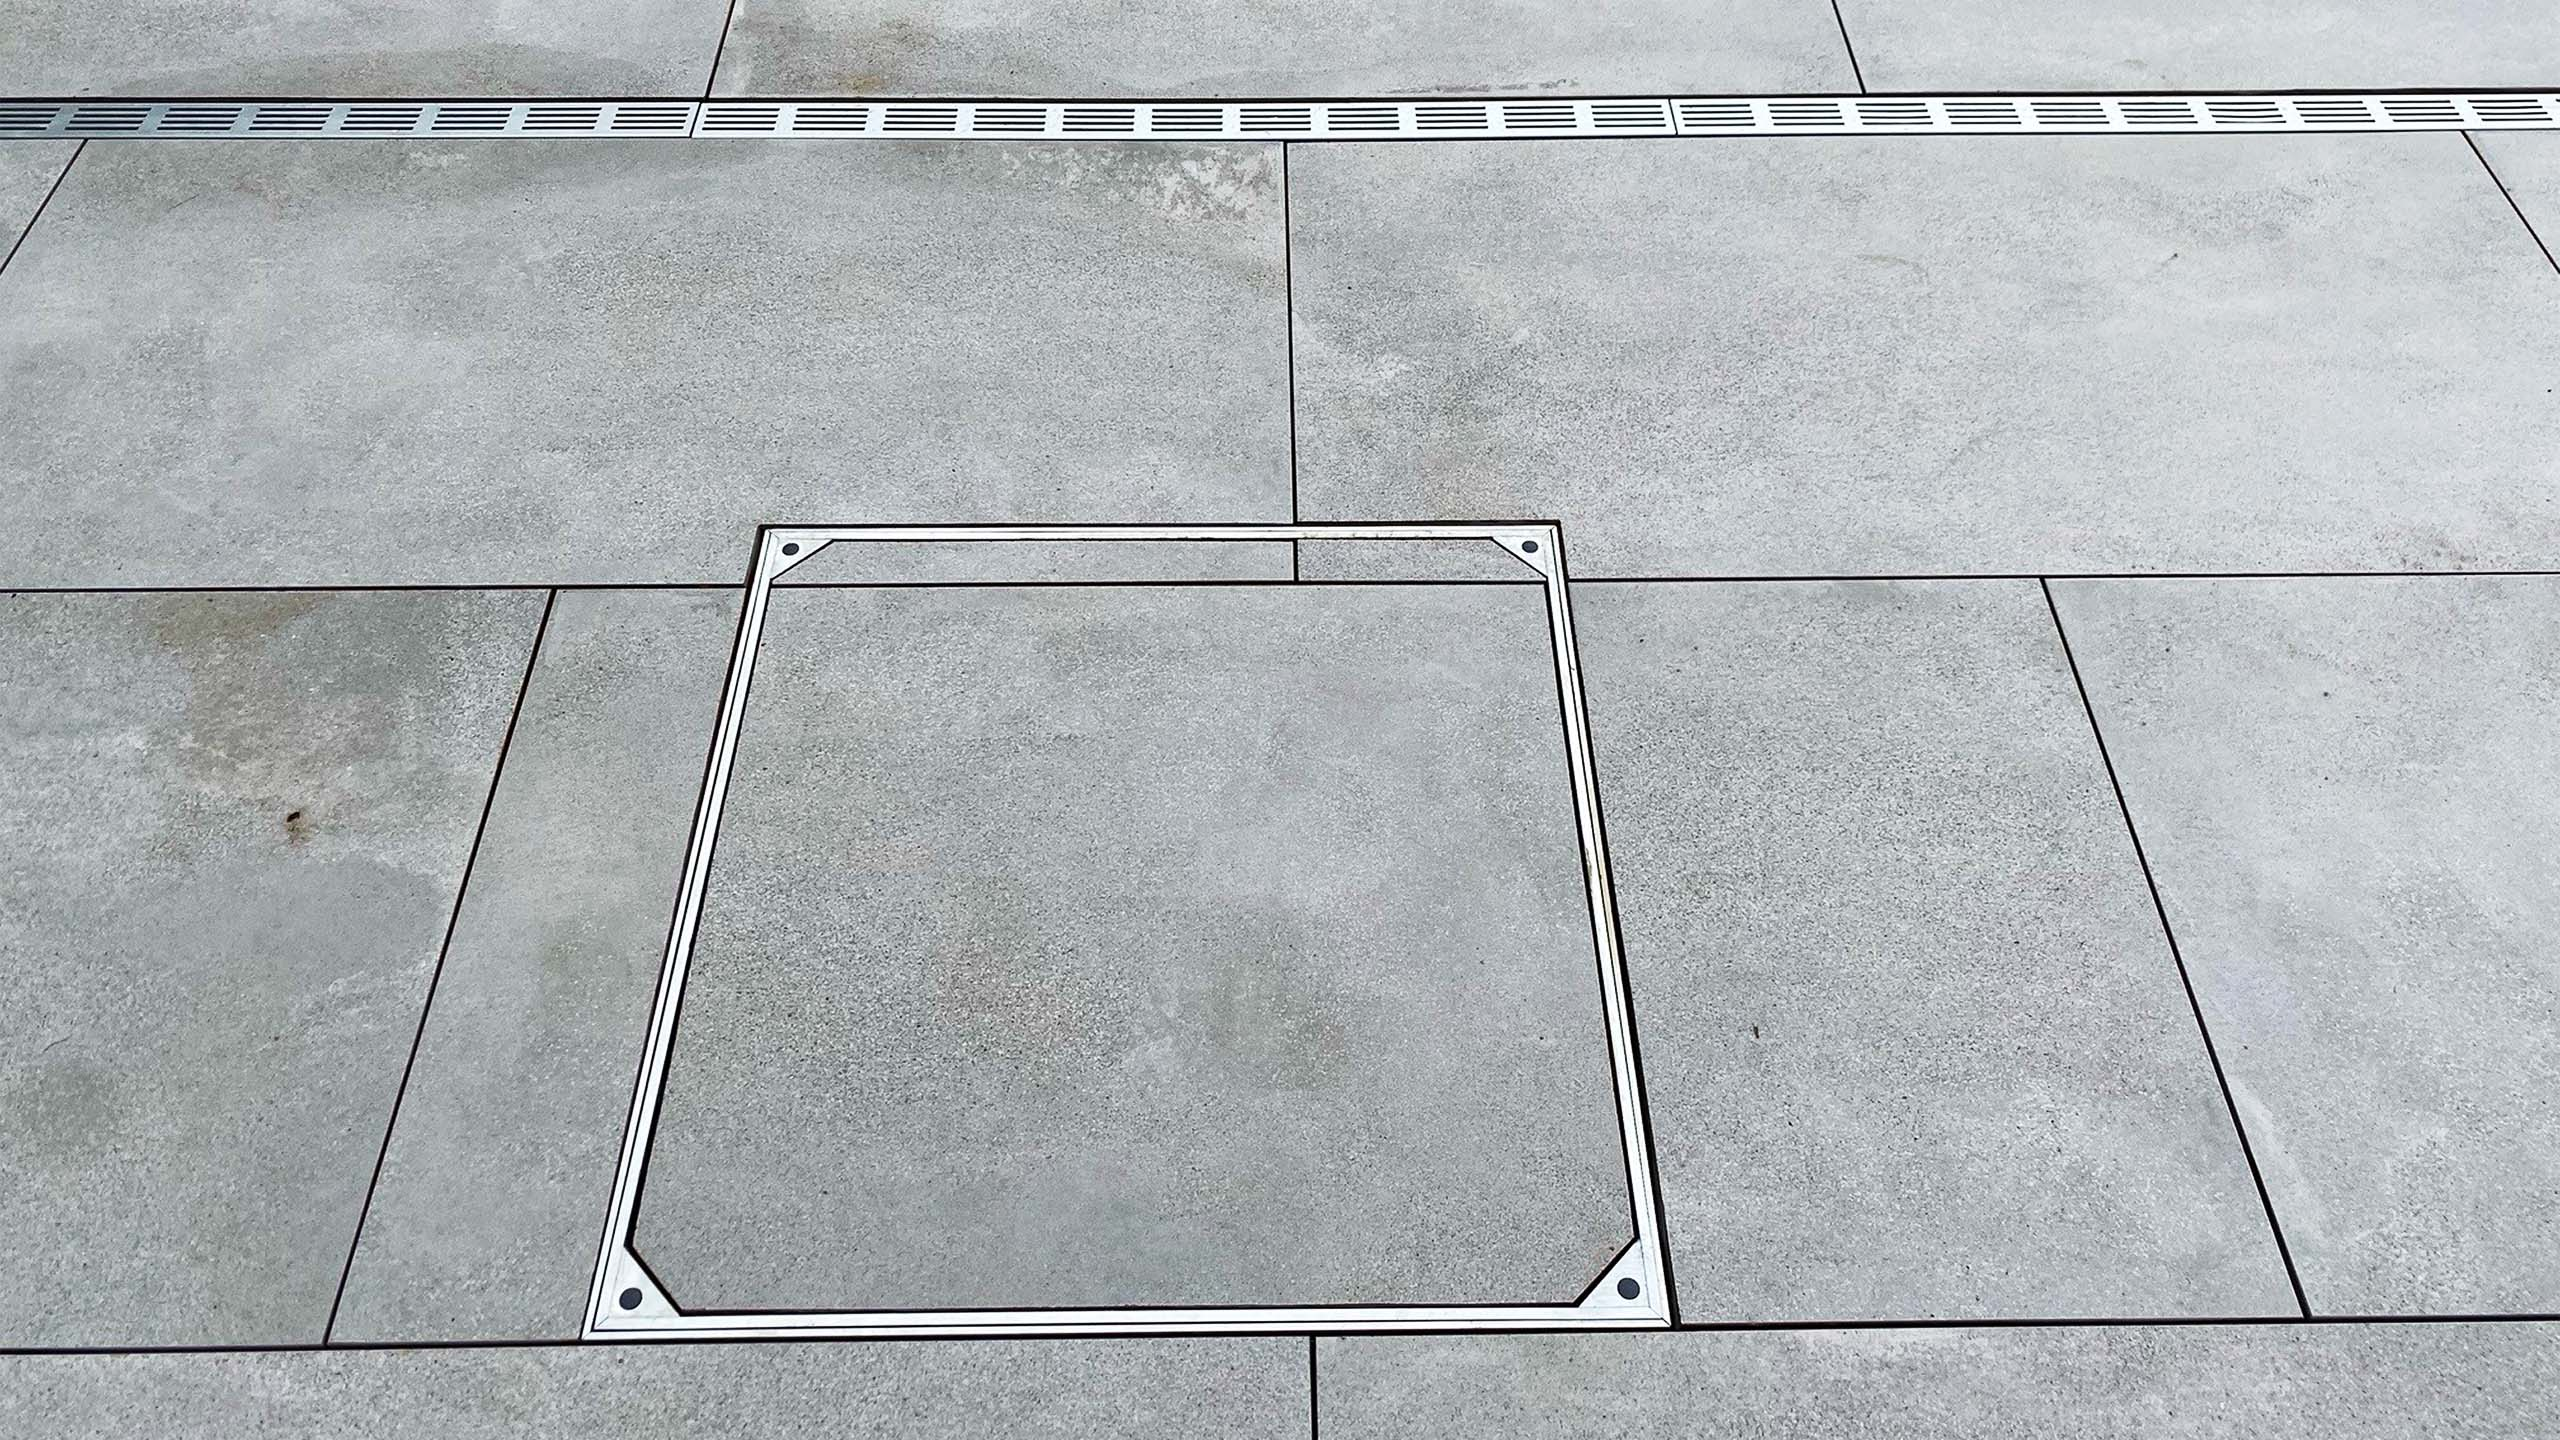 Aluminium Triple Sealed Manhole Cover With Slab Floor And Threshold Drain